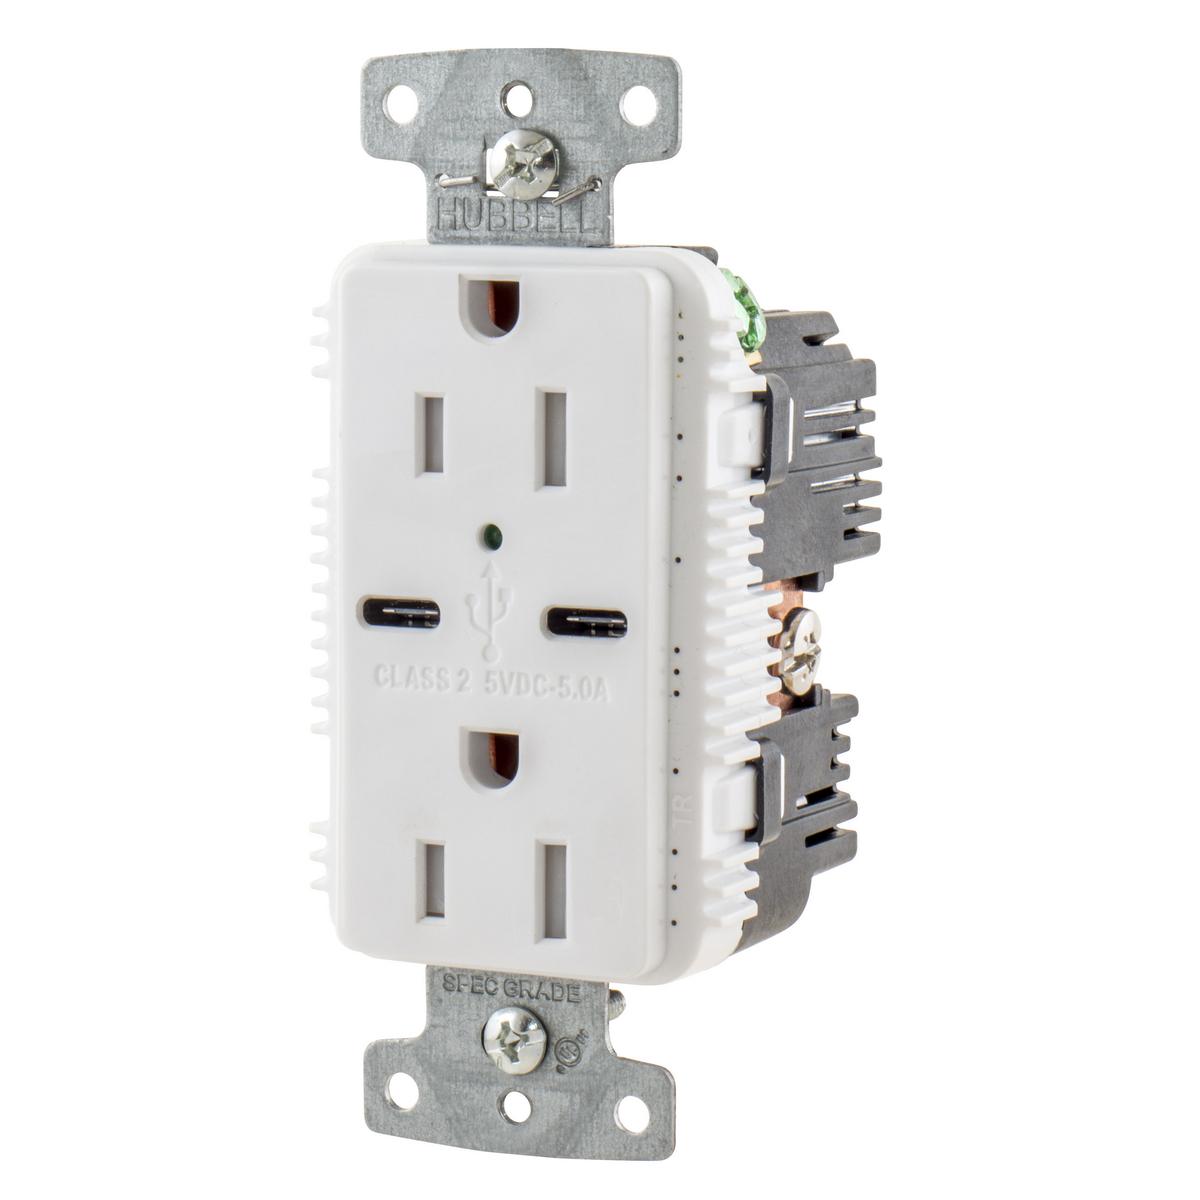 Hubbell USB15C5W Receptacle DUP 15A 125V 5A 5V USB PORT C WH